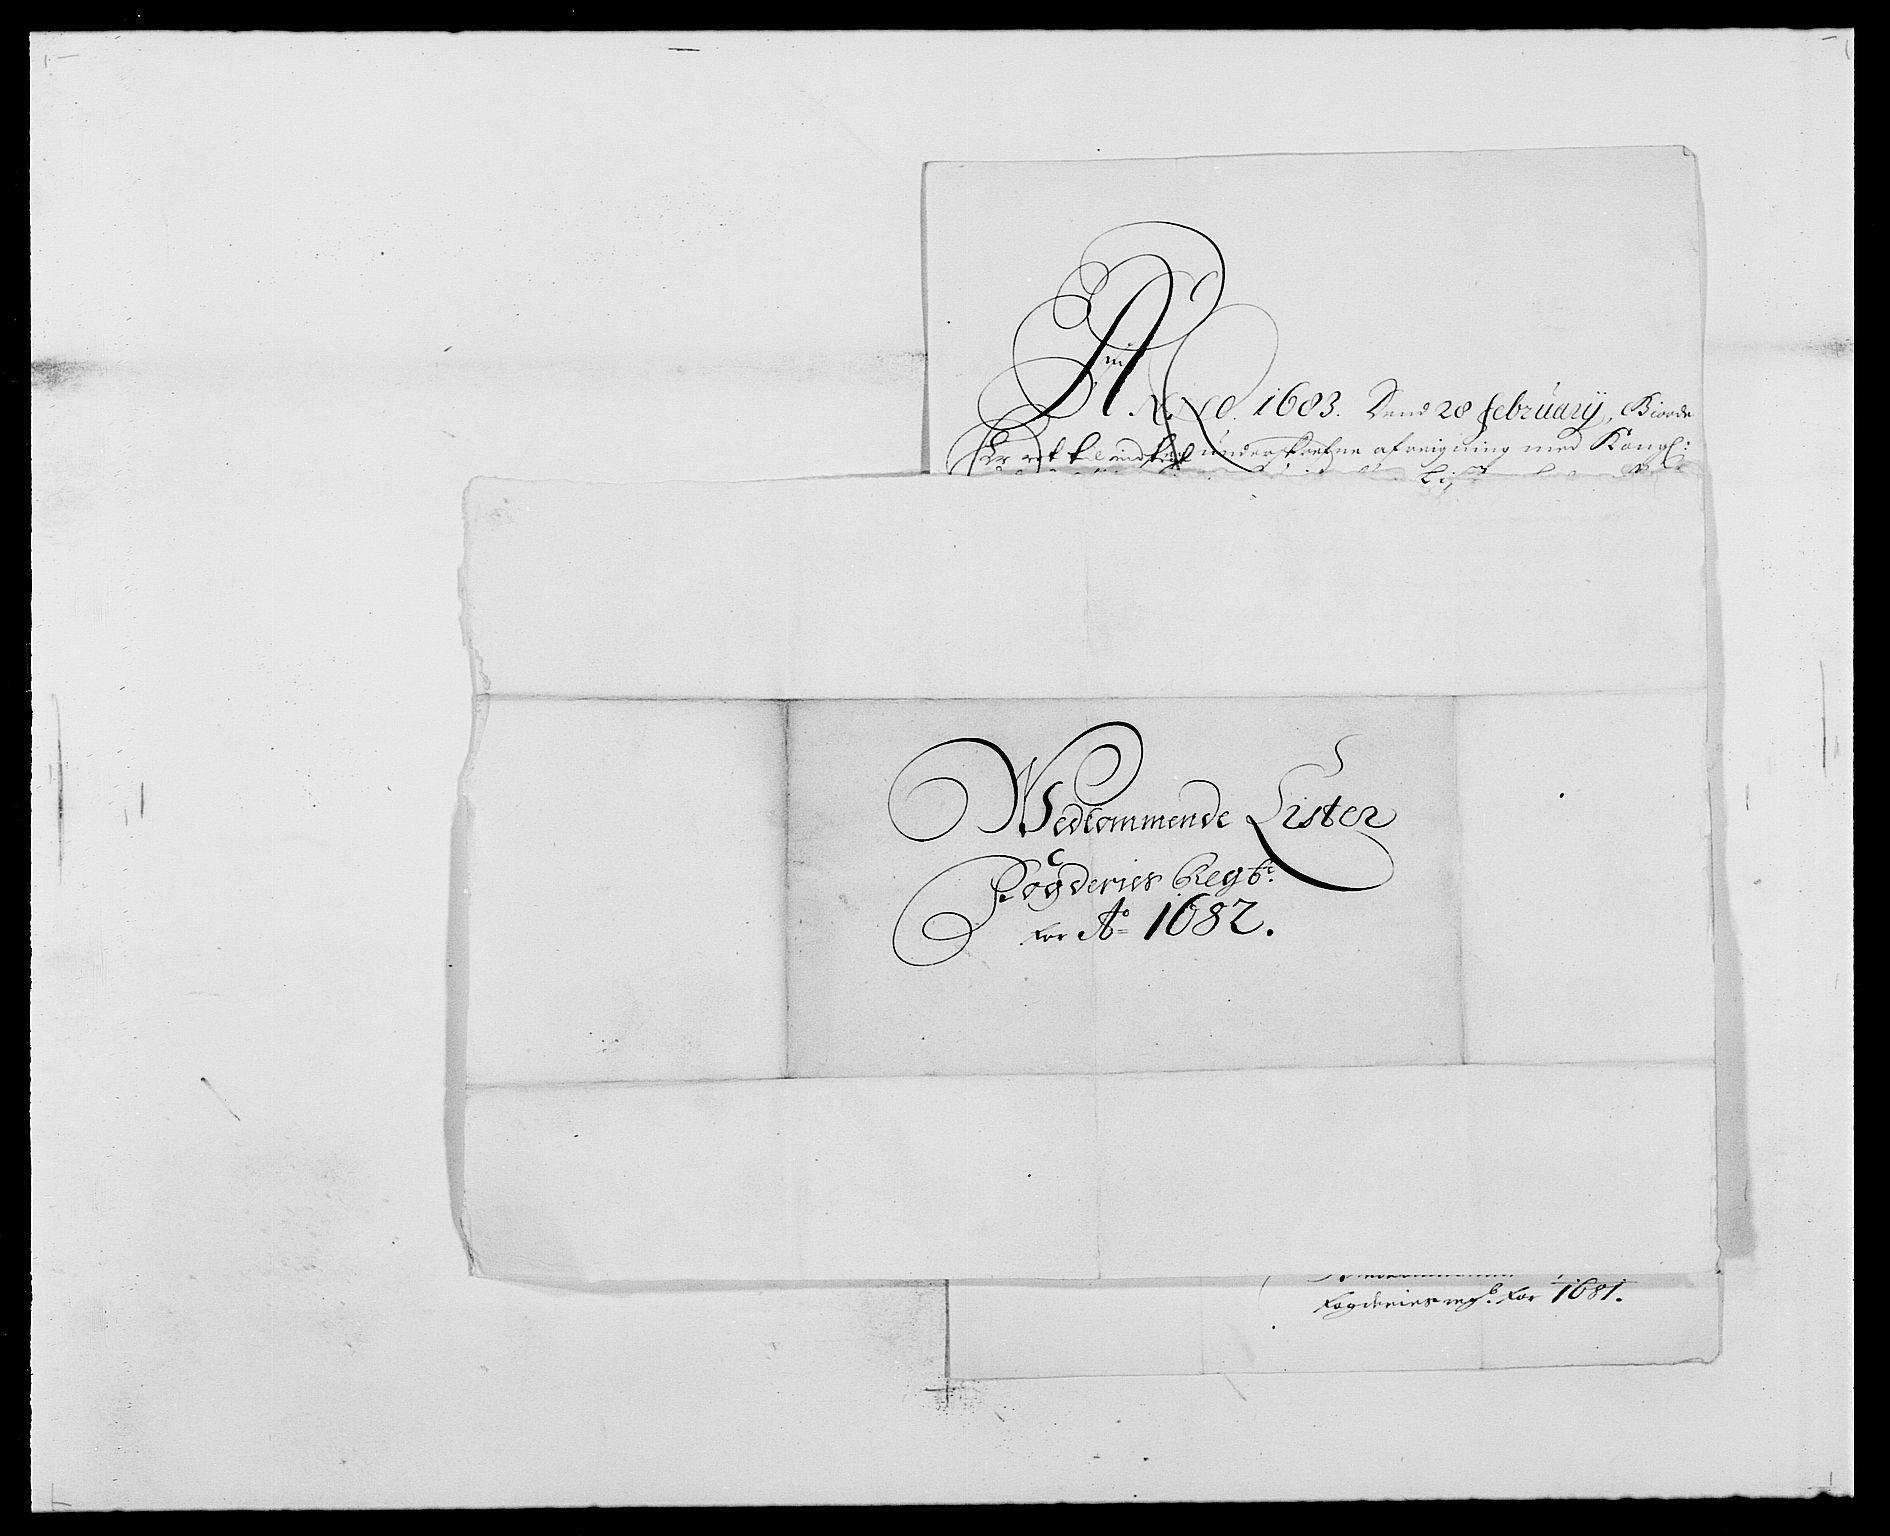 RA, Rentekammeret inntil 1814, Reviderte regnskaper, Fogderegnskap, R41/L2531: Fogderegnskap Lista, 1680-1682, s. 261